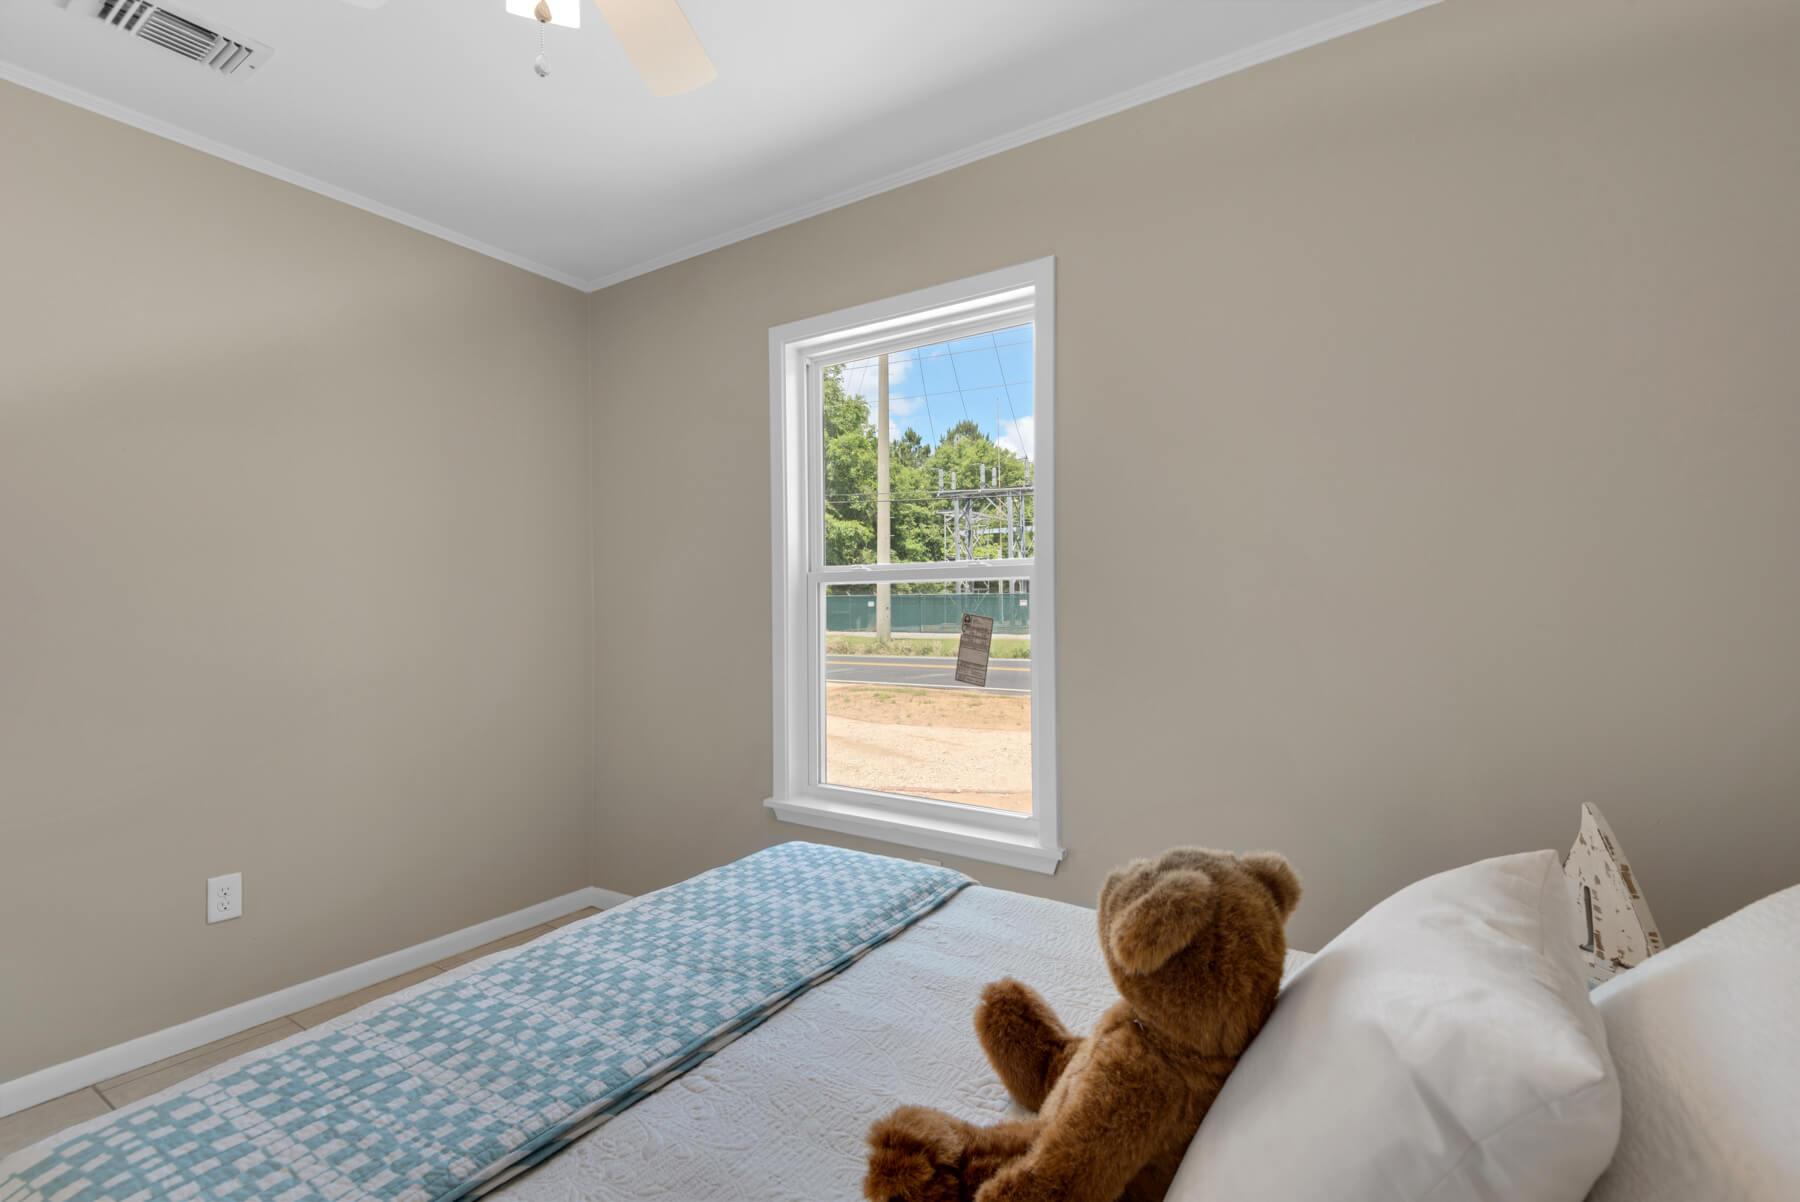 7466 Twin Beech Road Fairhope for Sale Urban Property bedroom view 5